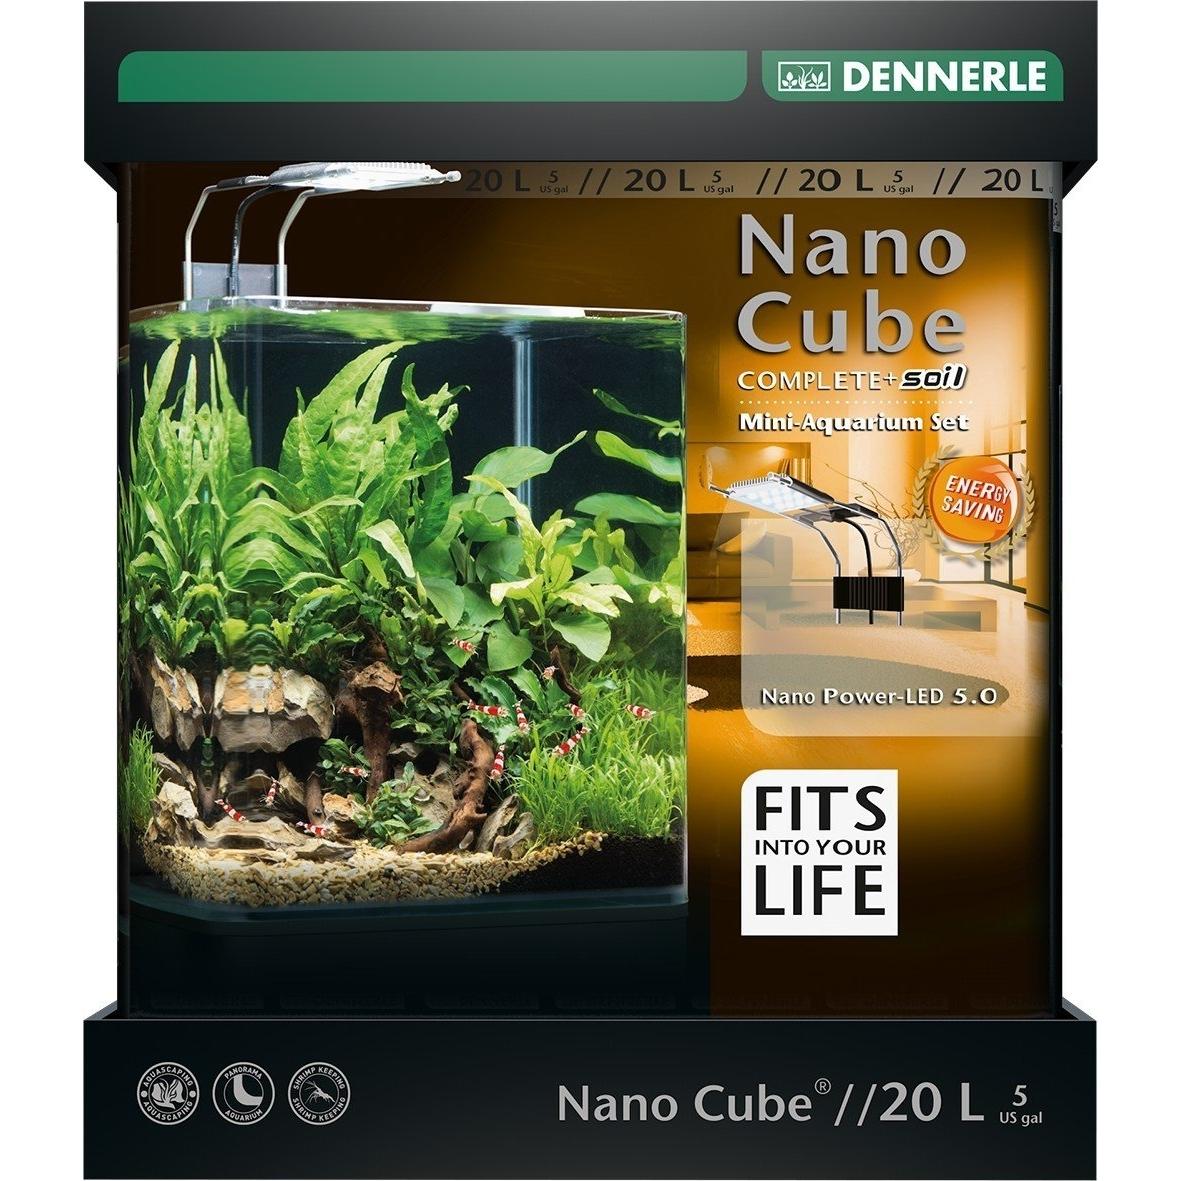 Dennerle NanoCube Complete+ SOIL PowerLED 5.0 Bild 2